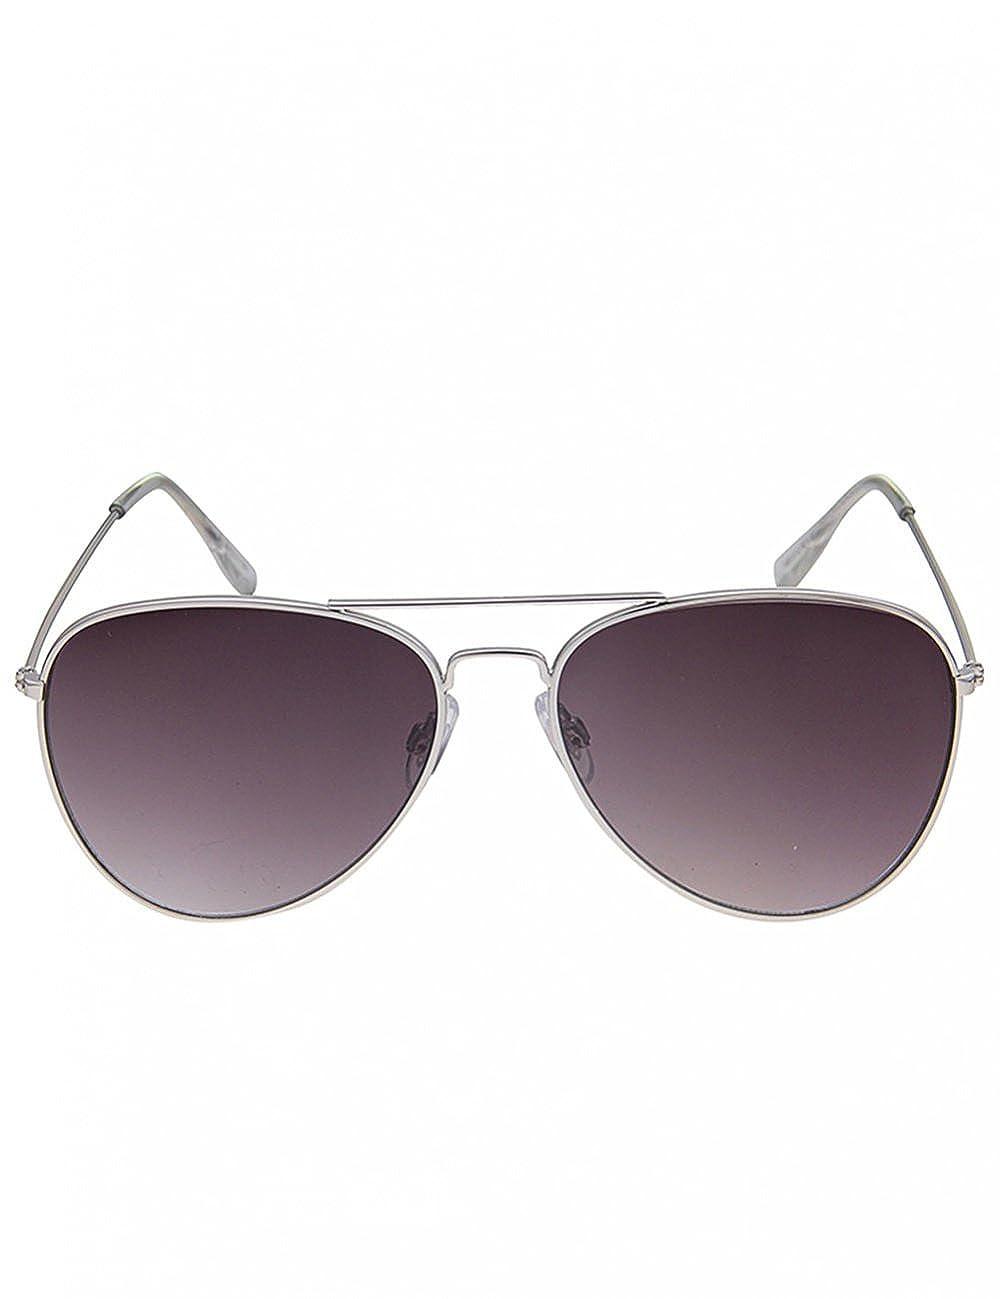 Leslii Damen Sonnenbrille Classic Look Schwarz Kunststoff Ø